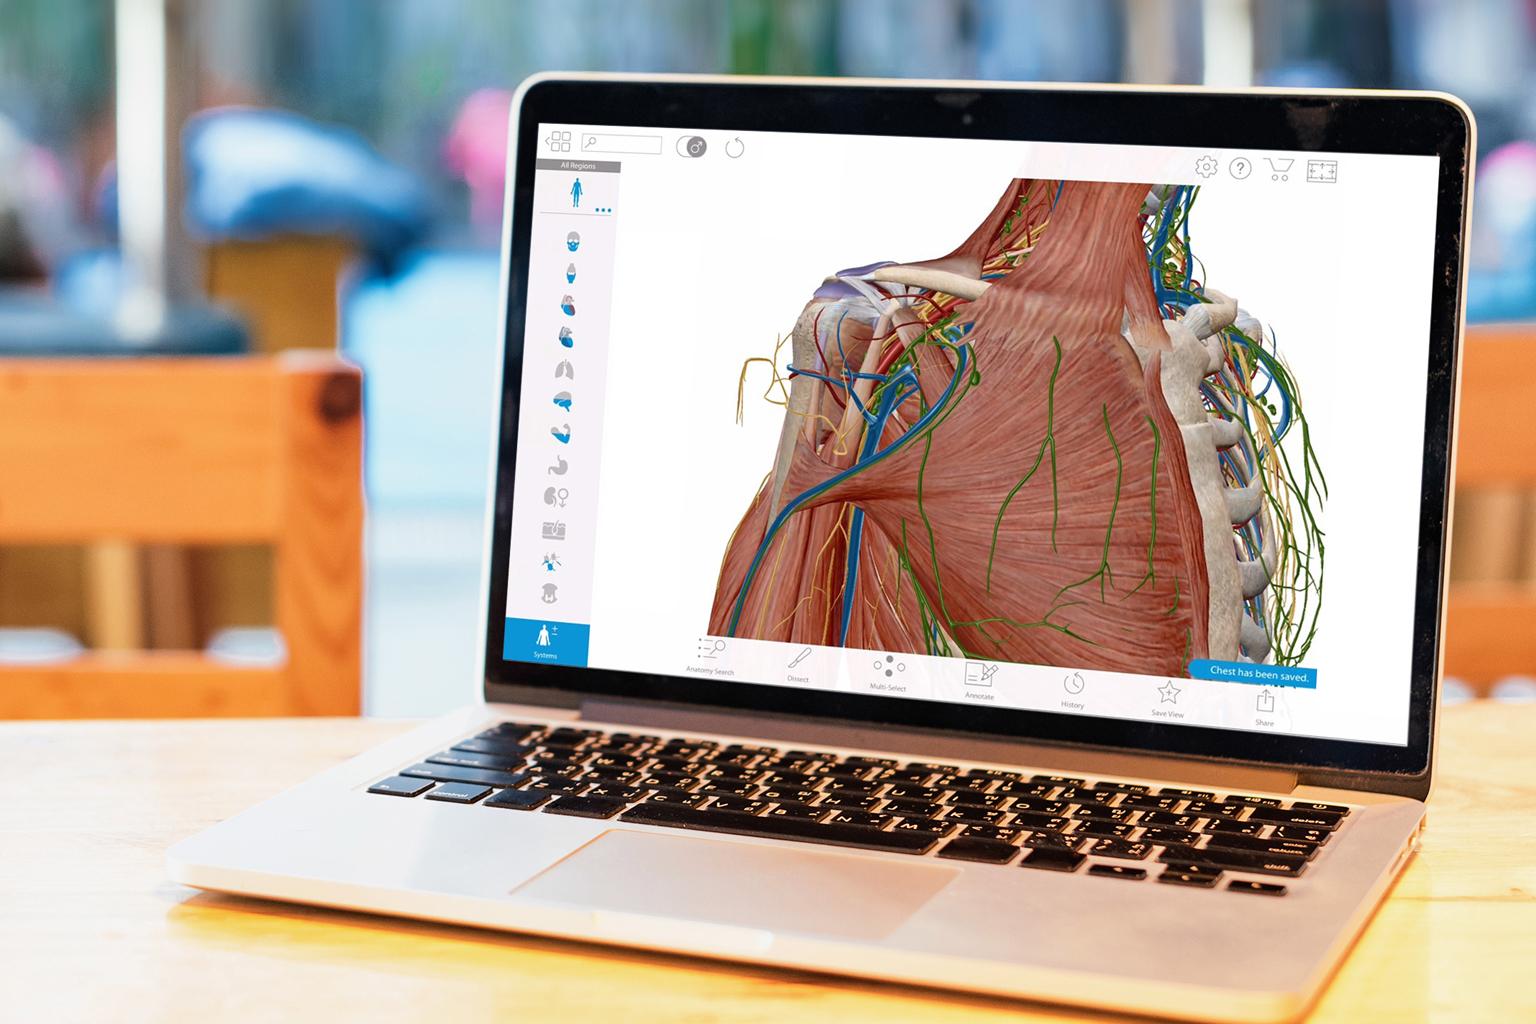 Visible body program open on laptop